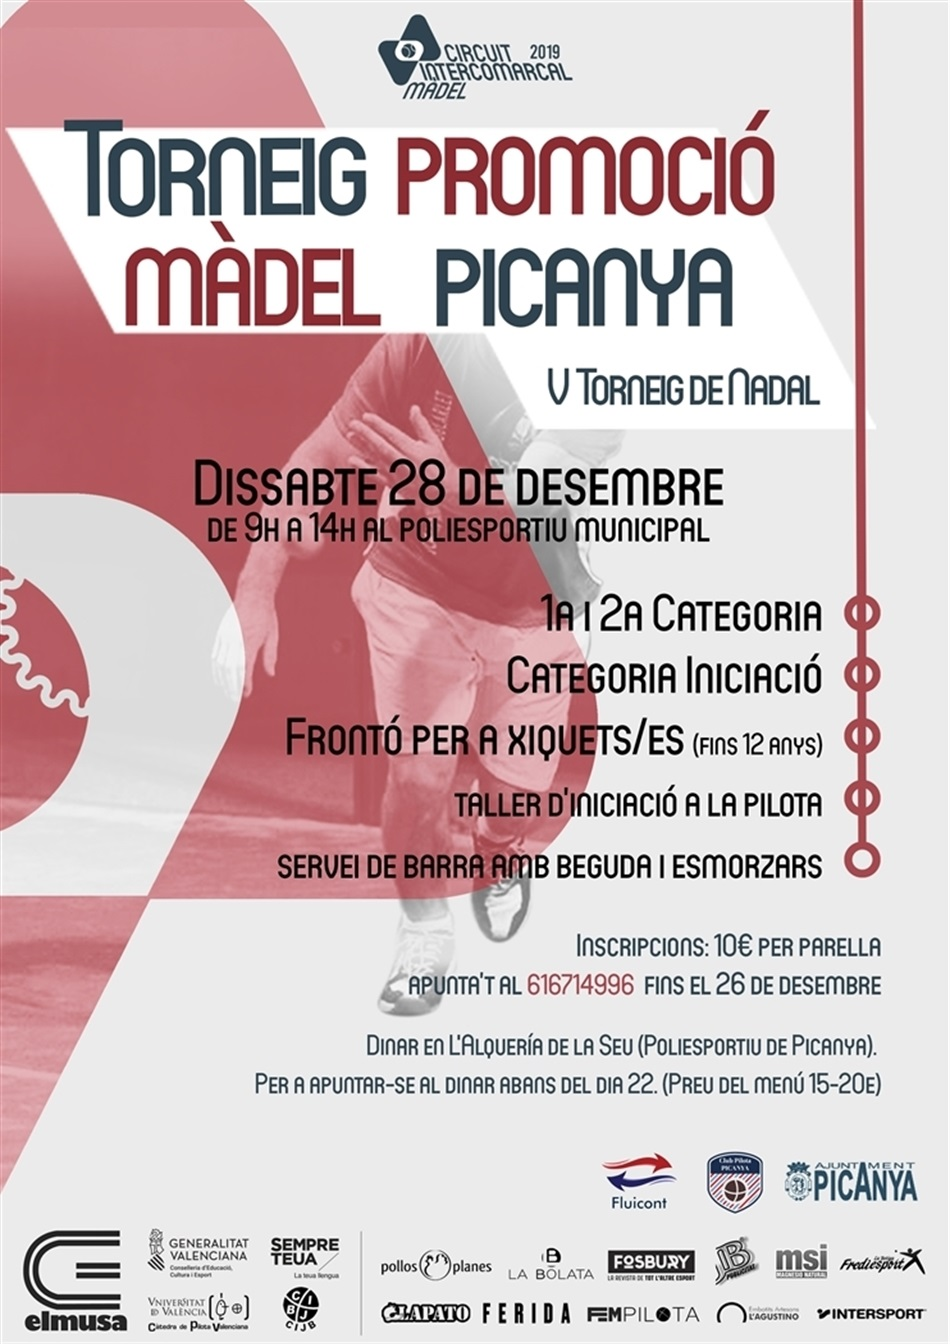 torneig madel picanya nadal 2019